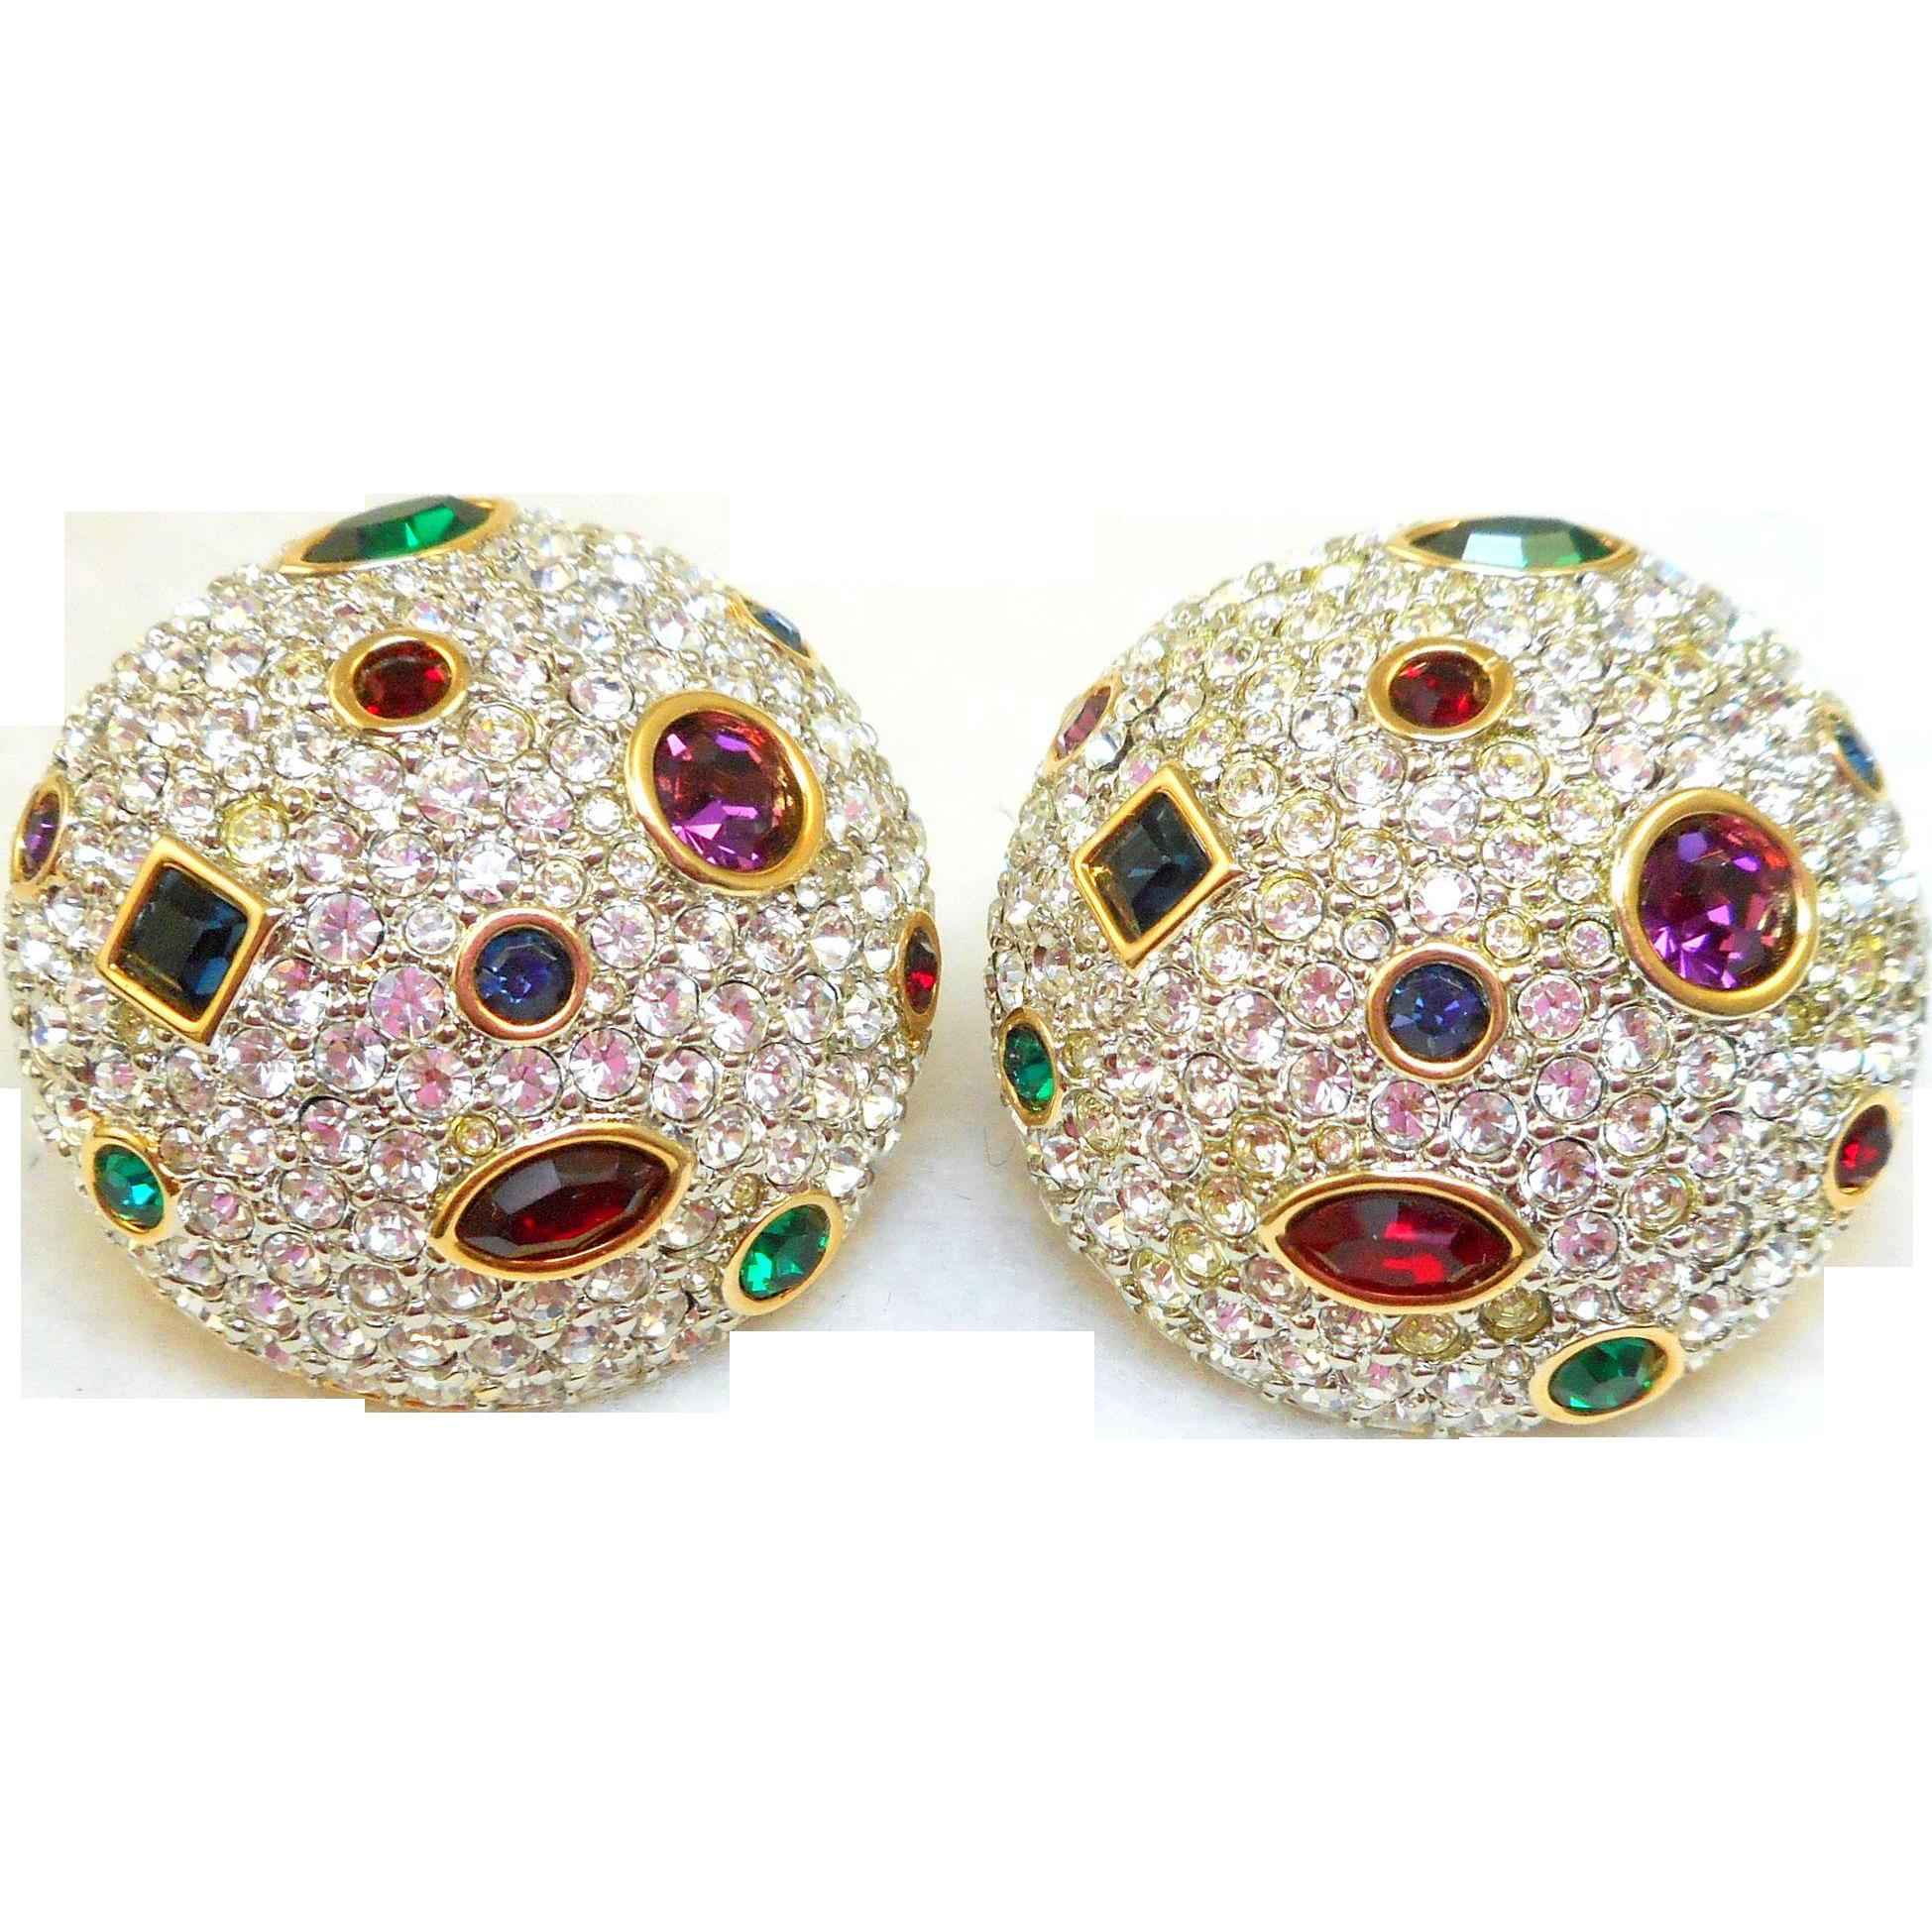 NOS Swarovski Domed Clip Earrings - MOC